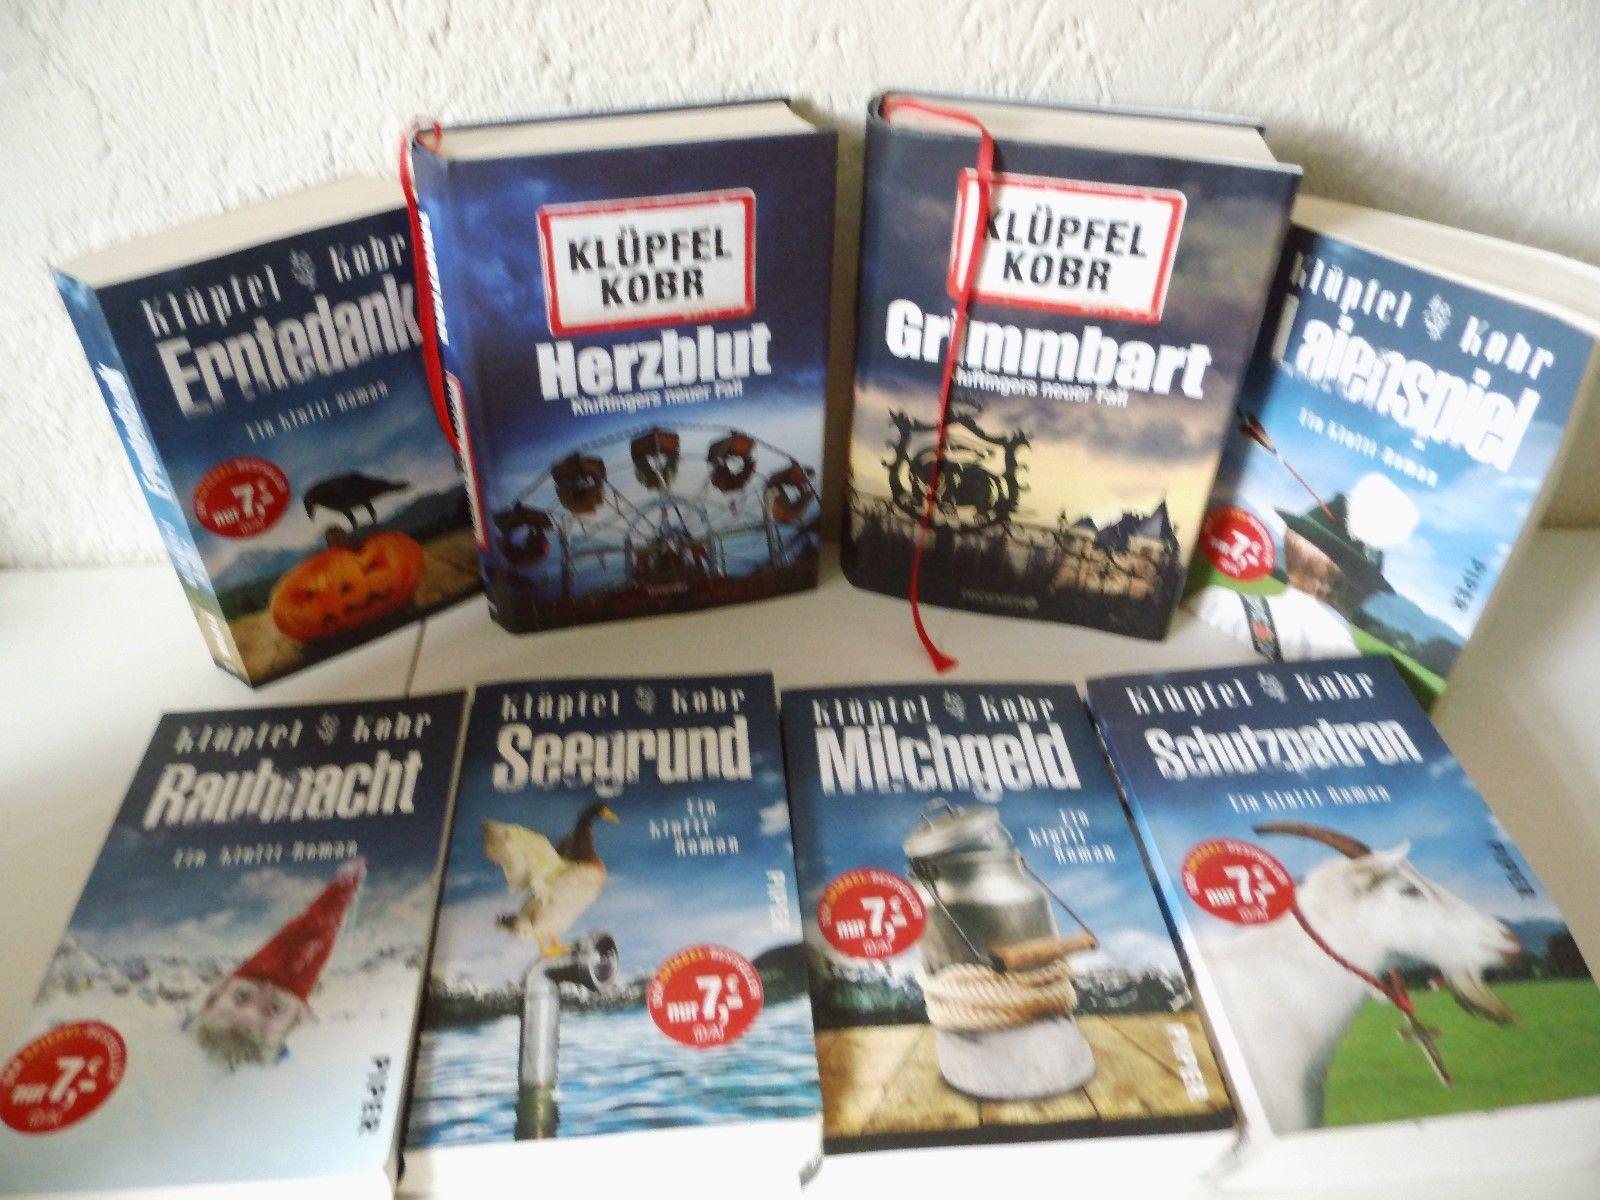 8 Stück, Klüpfel / Kobr Bayern Krimis.Kommissar Kluftinger.Kult Krimi.